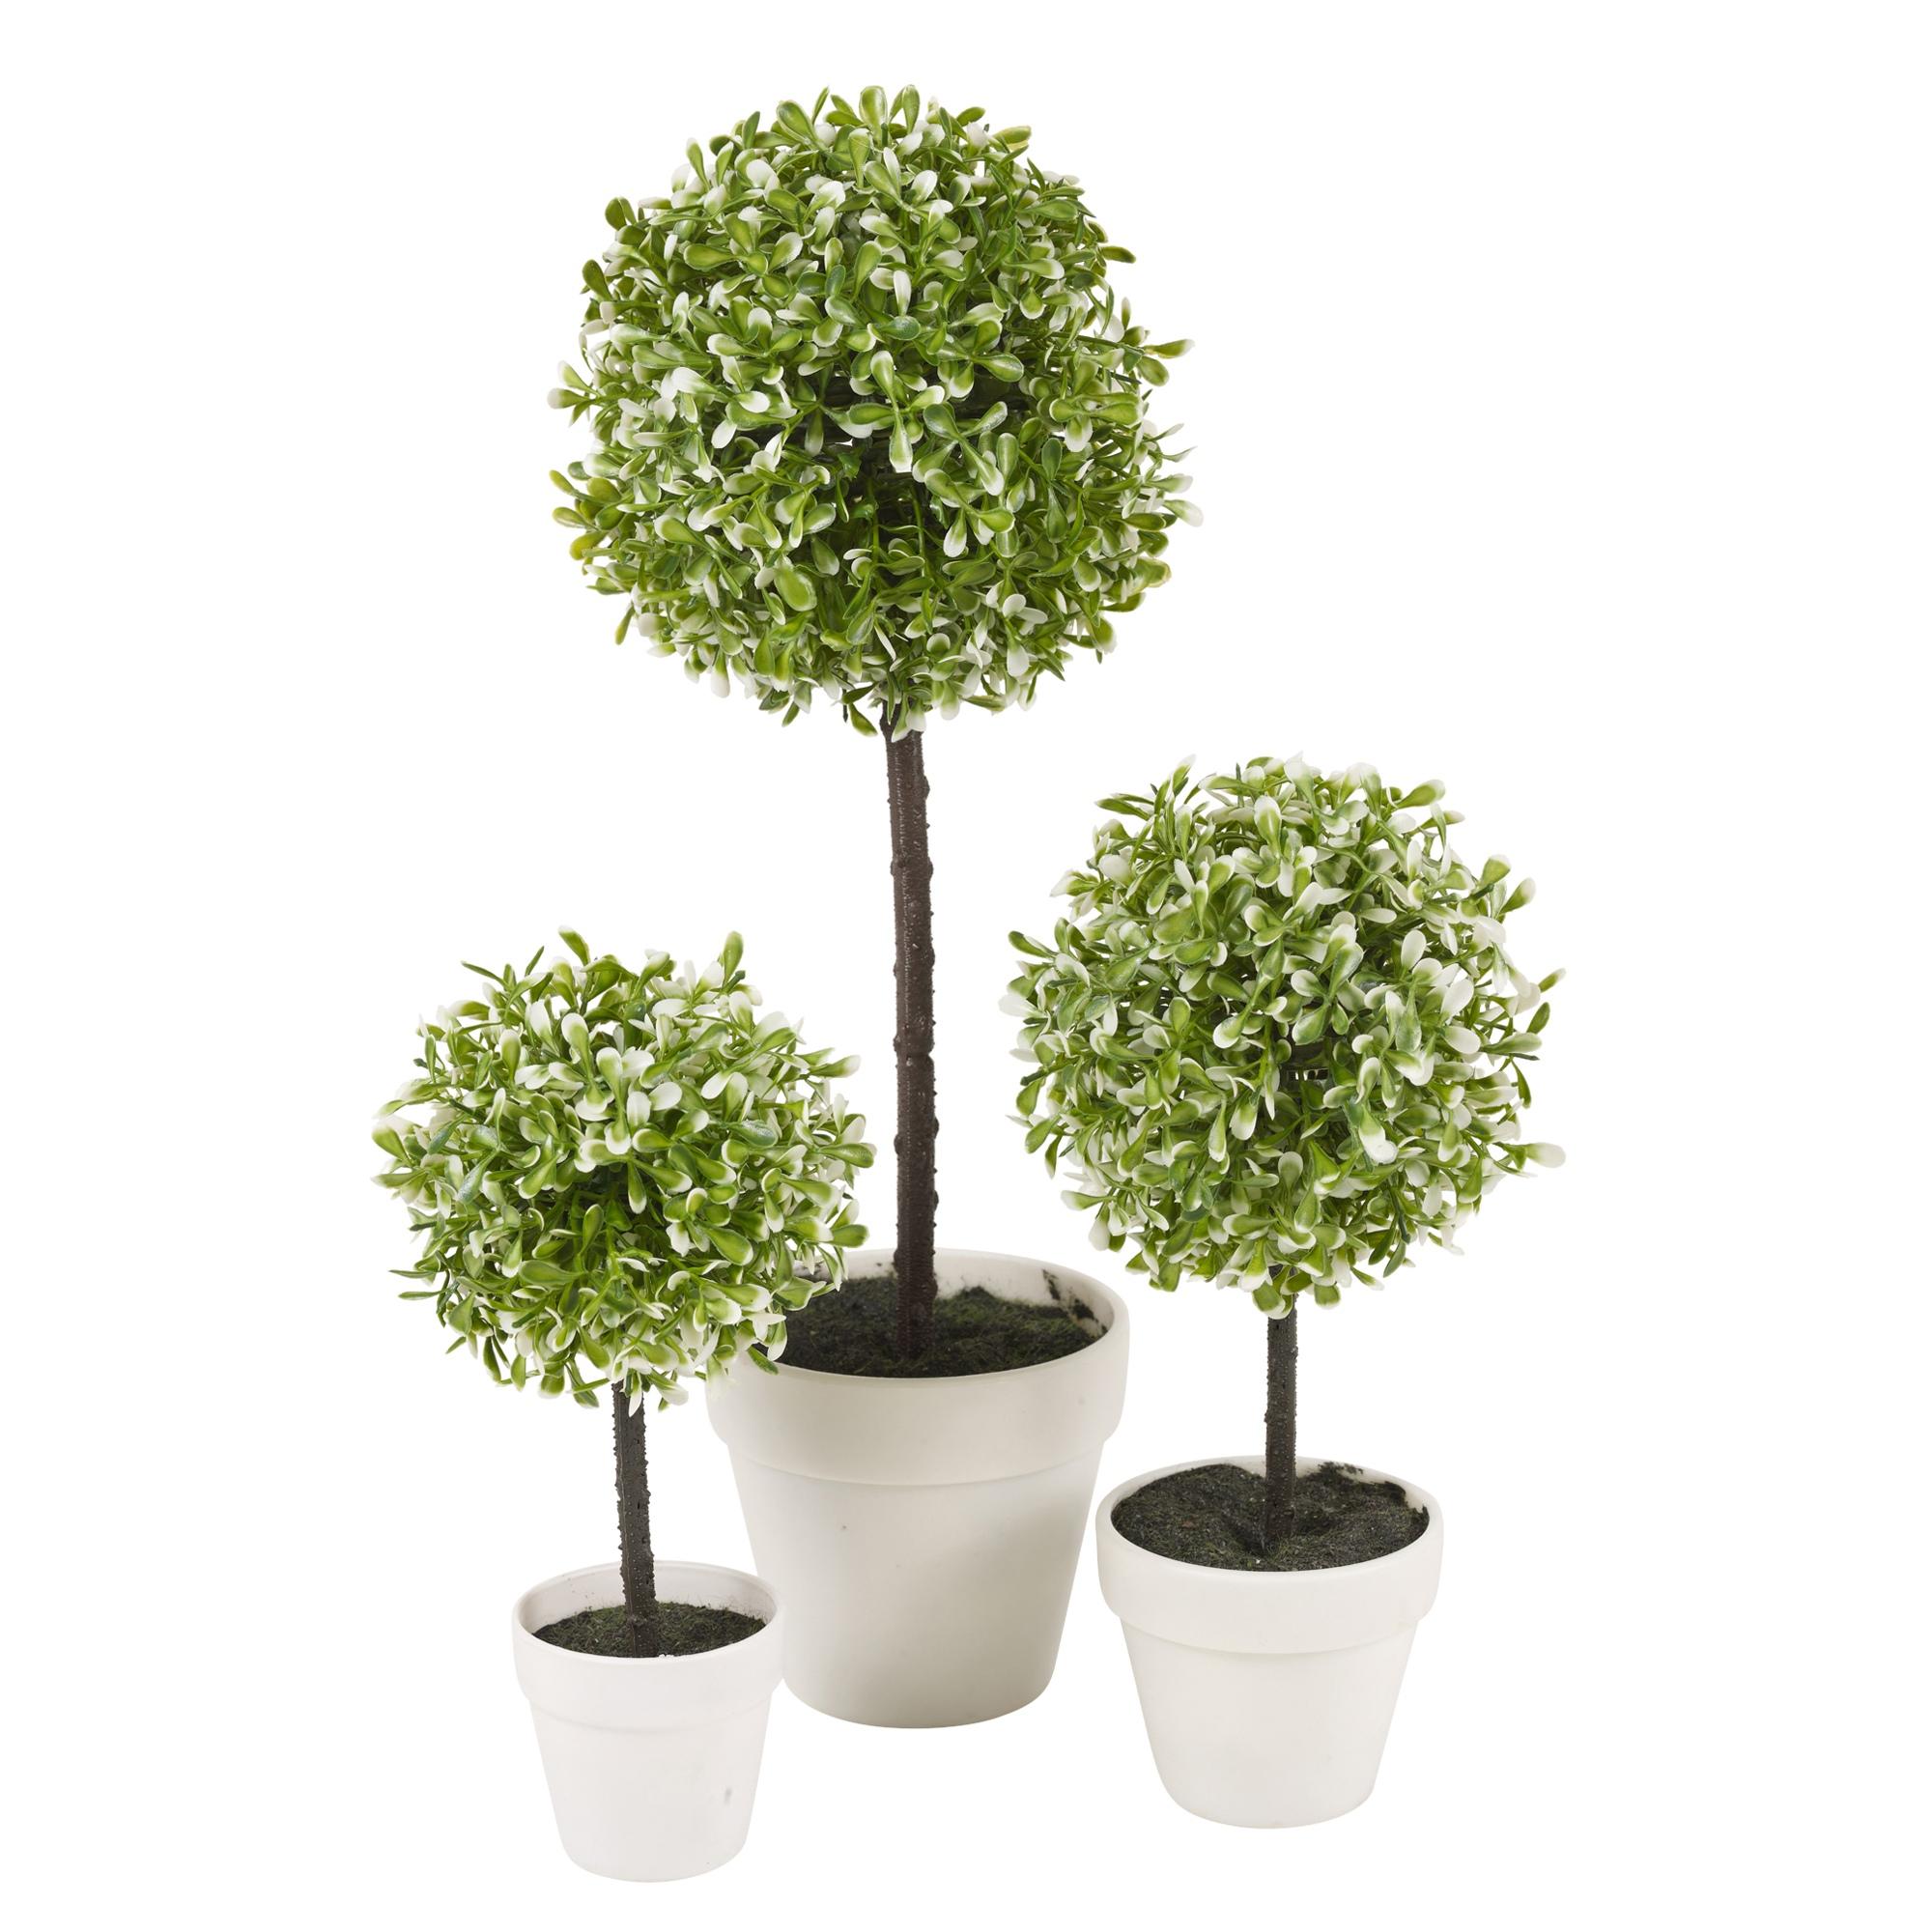 Decorative artificial outdoor ball plant tree pot colour for Outdoor decorative plants